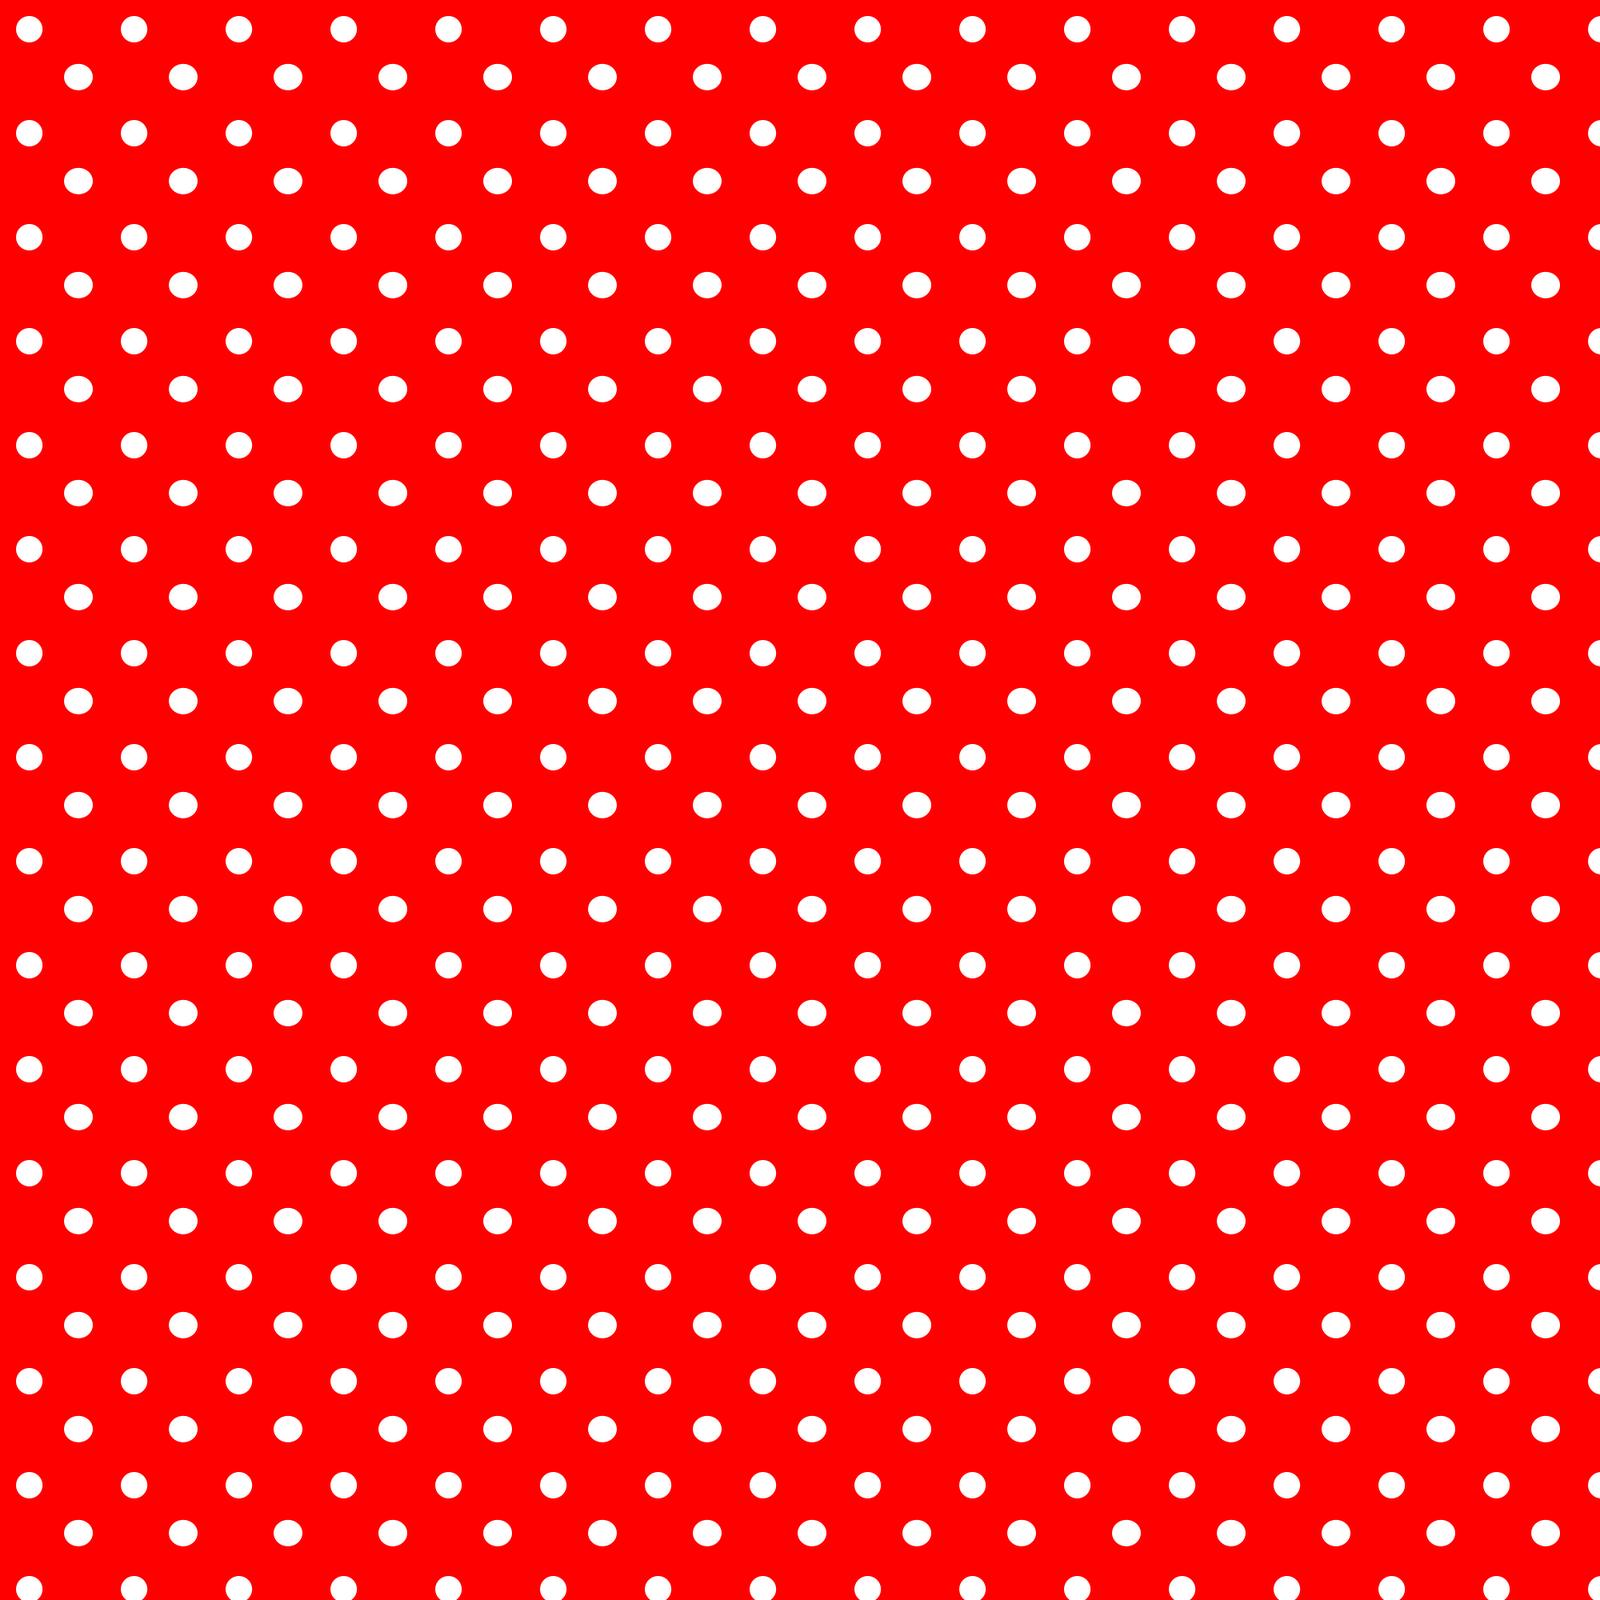 And white polka dot background